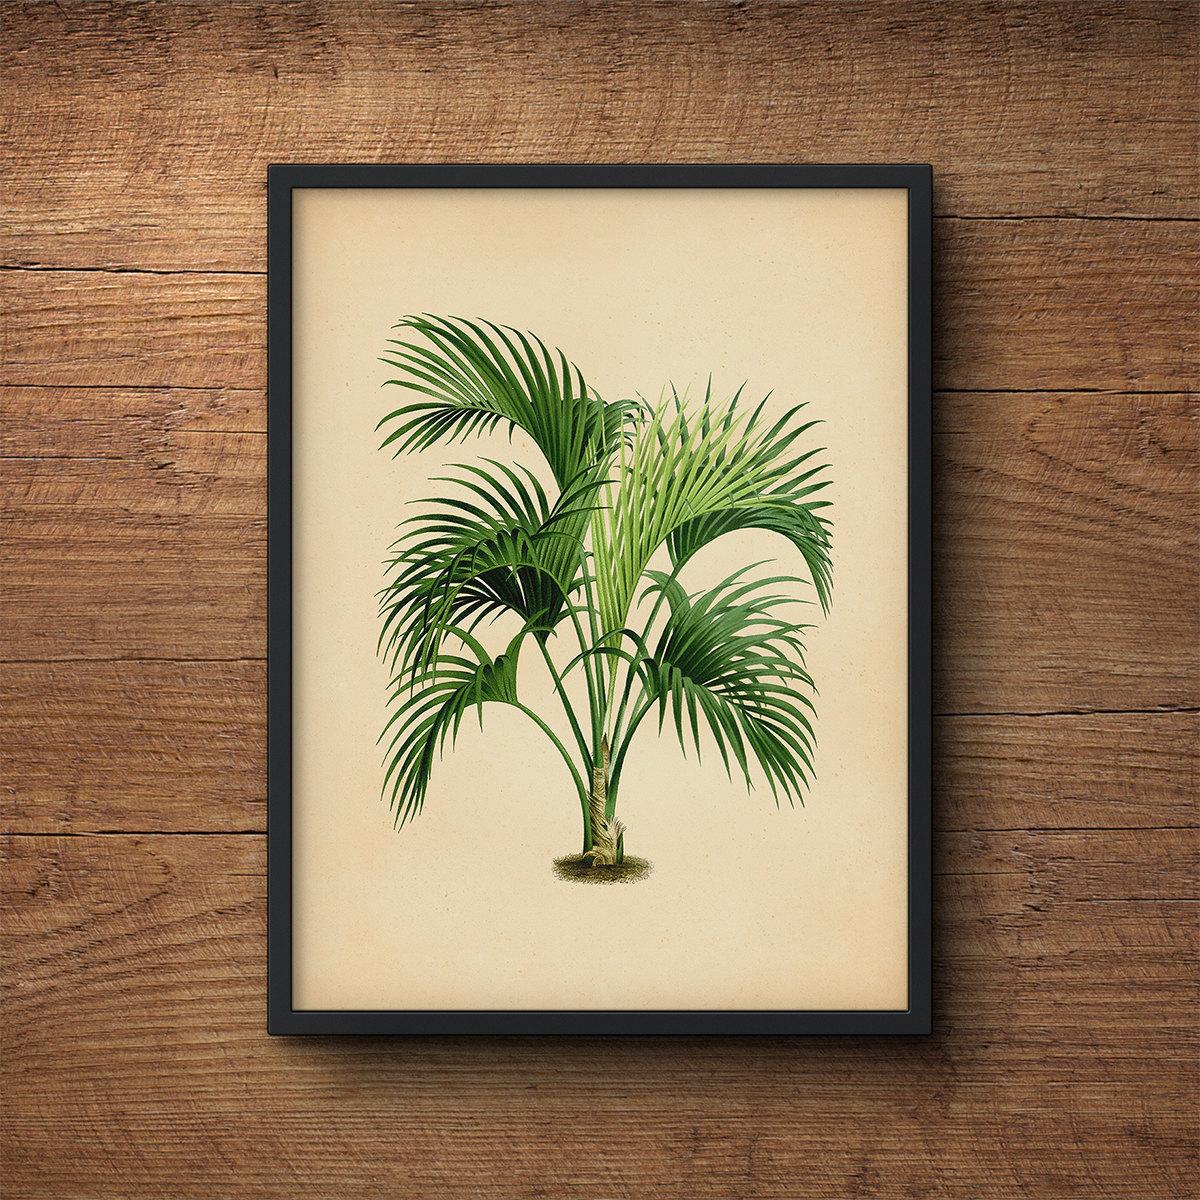 Wall Art Of Leaves : Palm tree art leaf wall decor prints